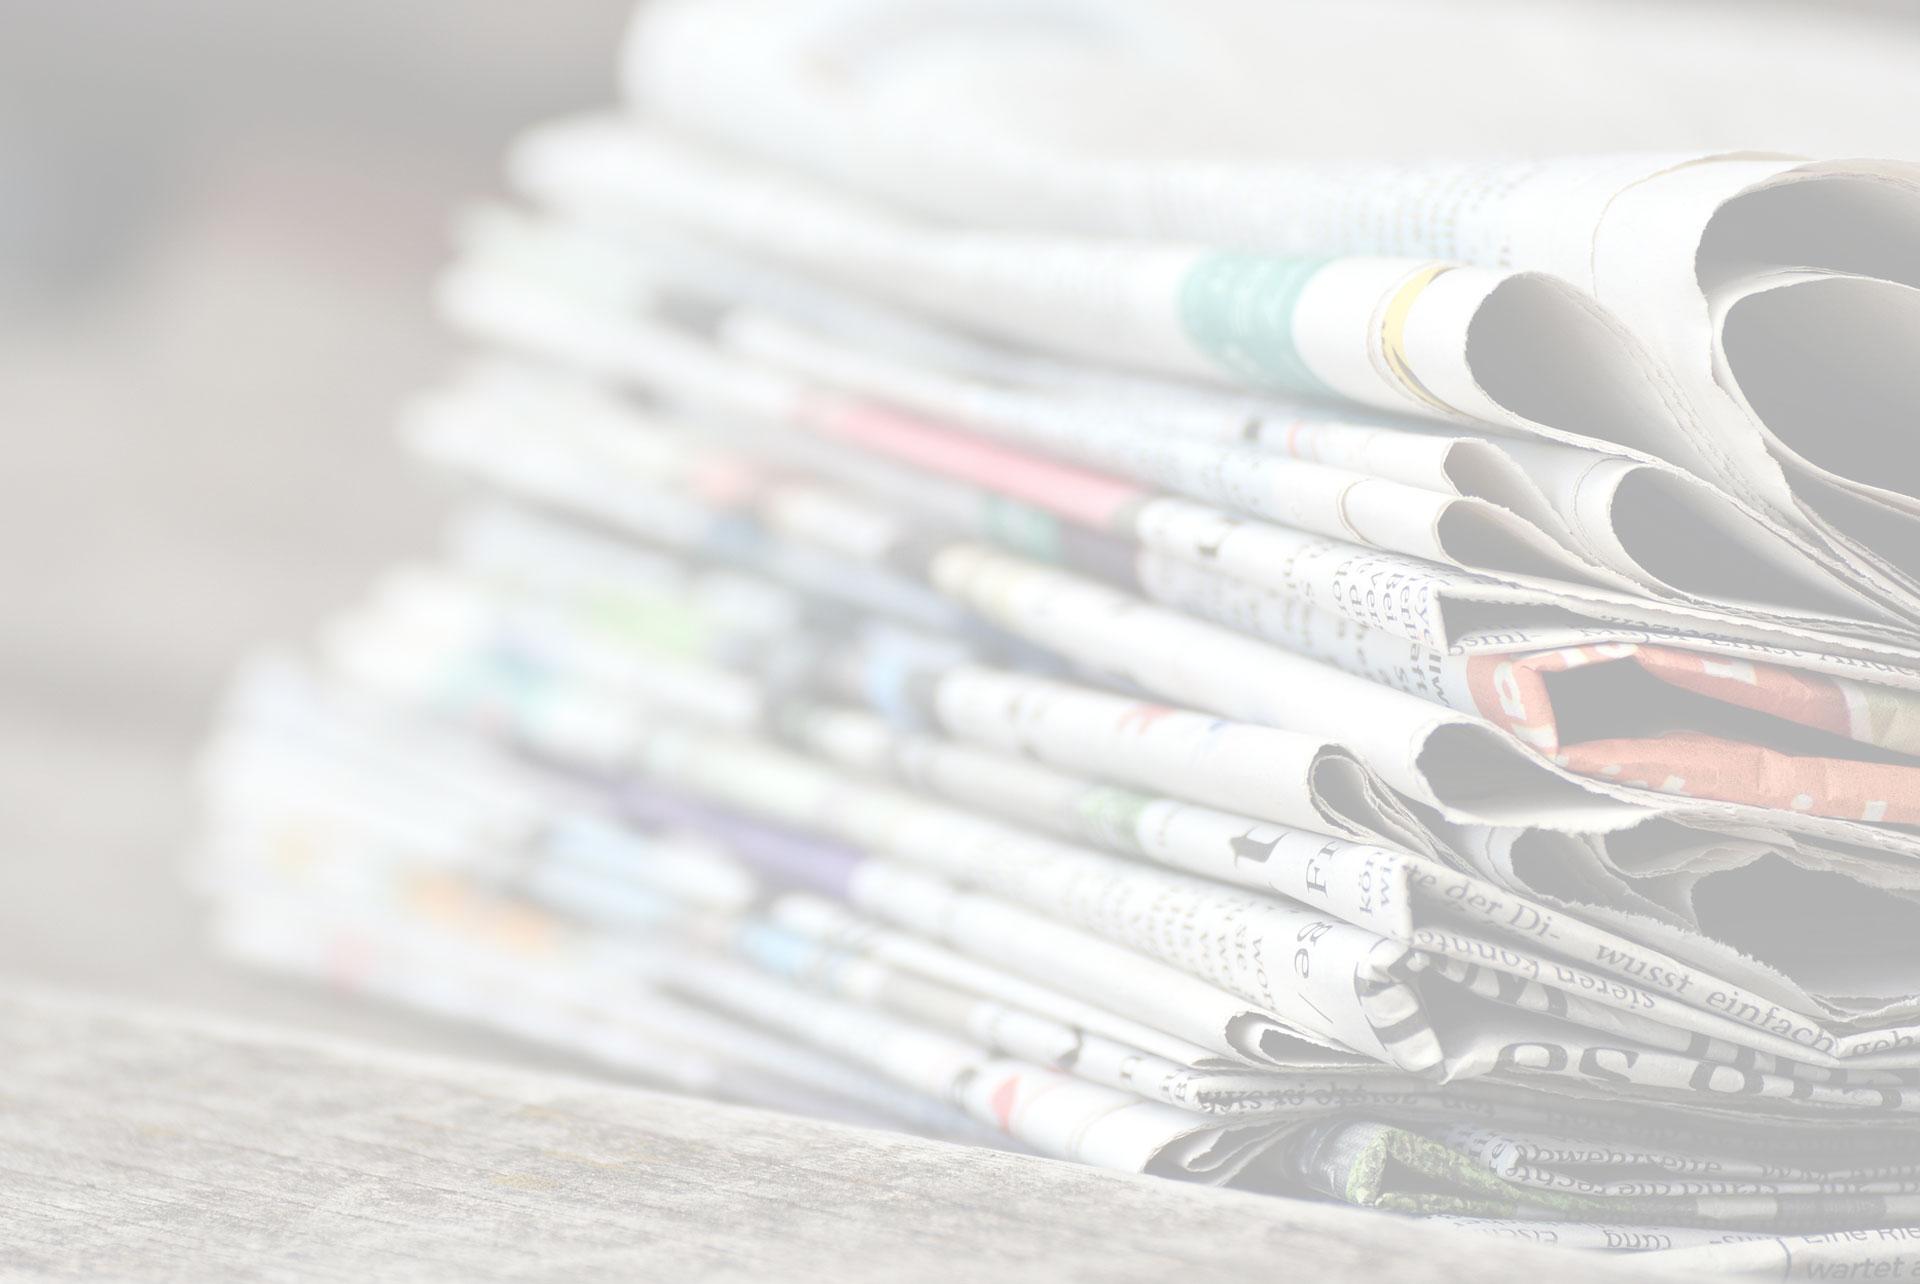 Mirabelli e Gennaro Gattuso Calciomercato Milan